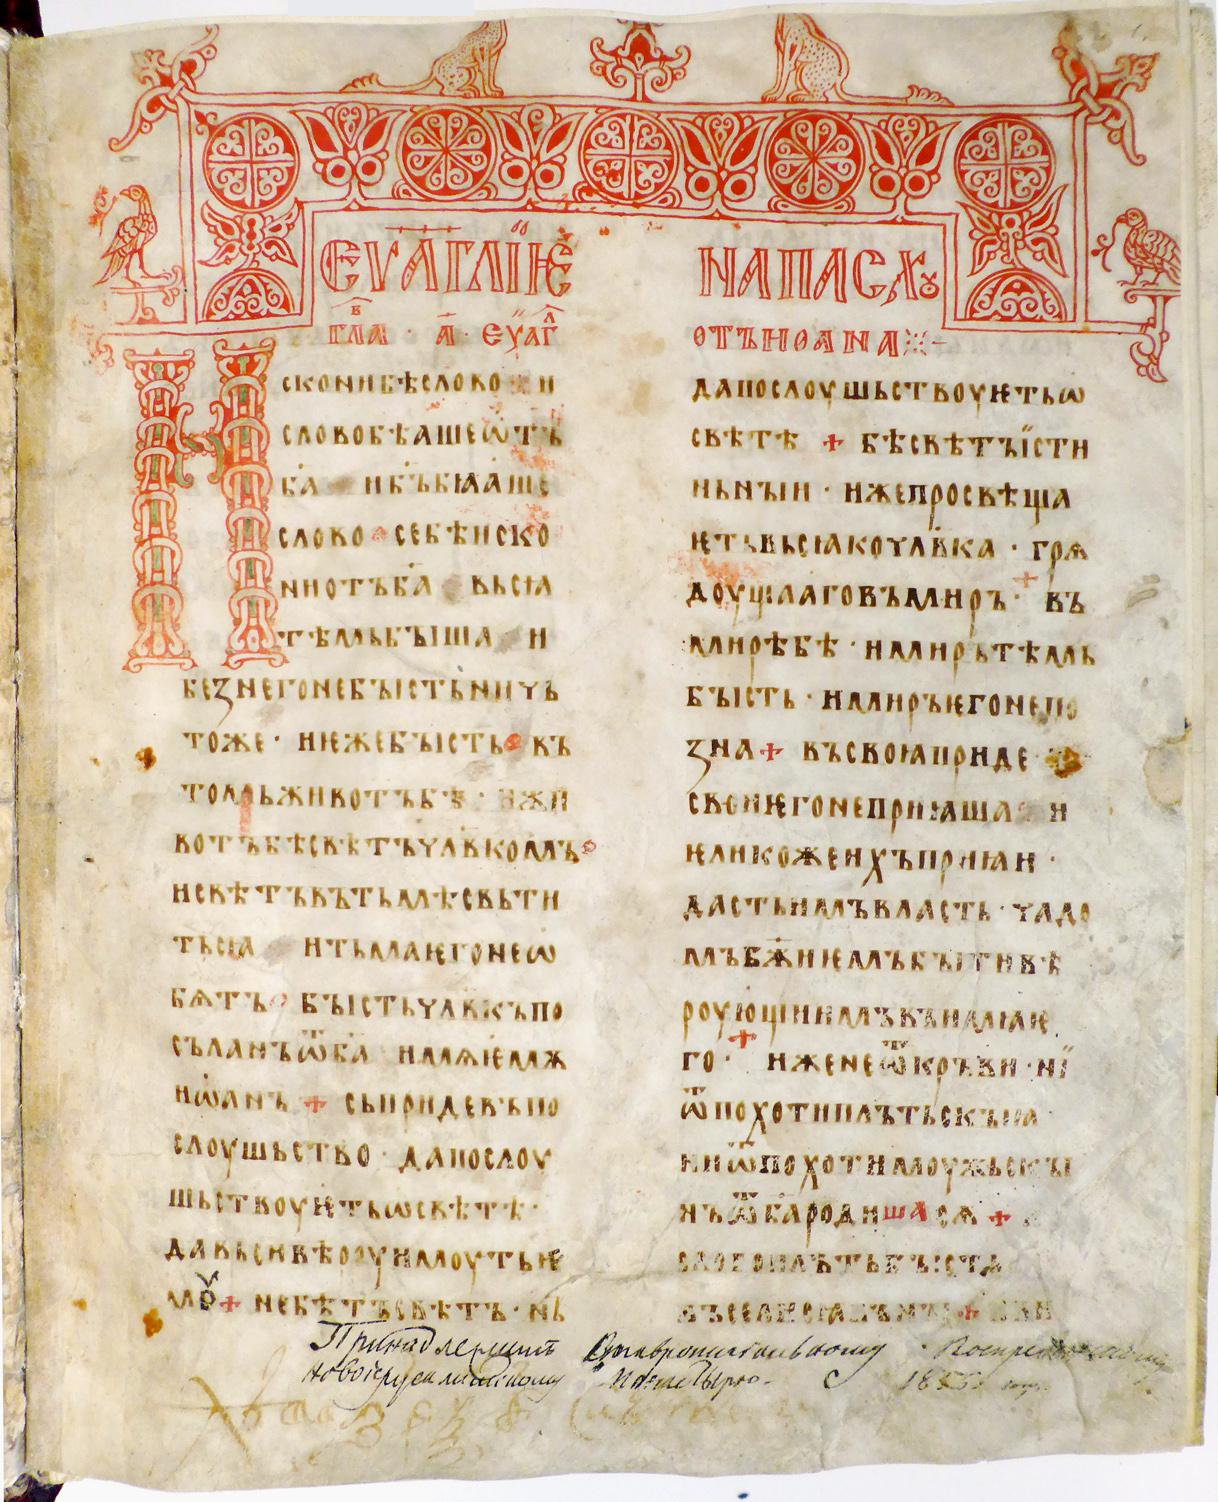 Юрьевское Евангелие, 1119–1128 гг. (ГИМ. Син. 1003). Л. 2. Заставка и начало текста.